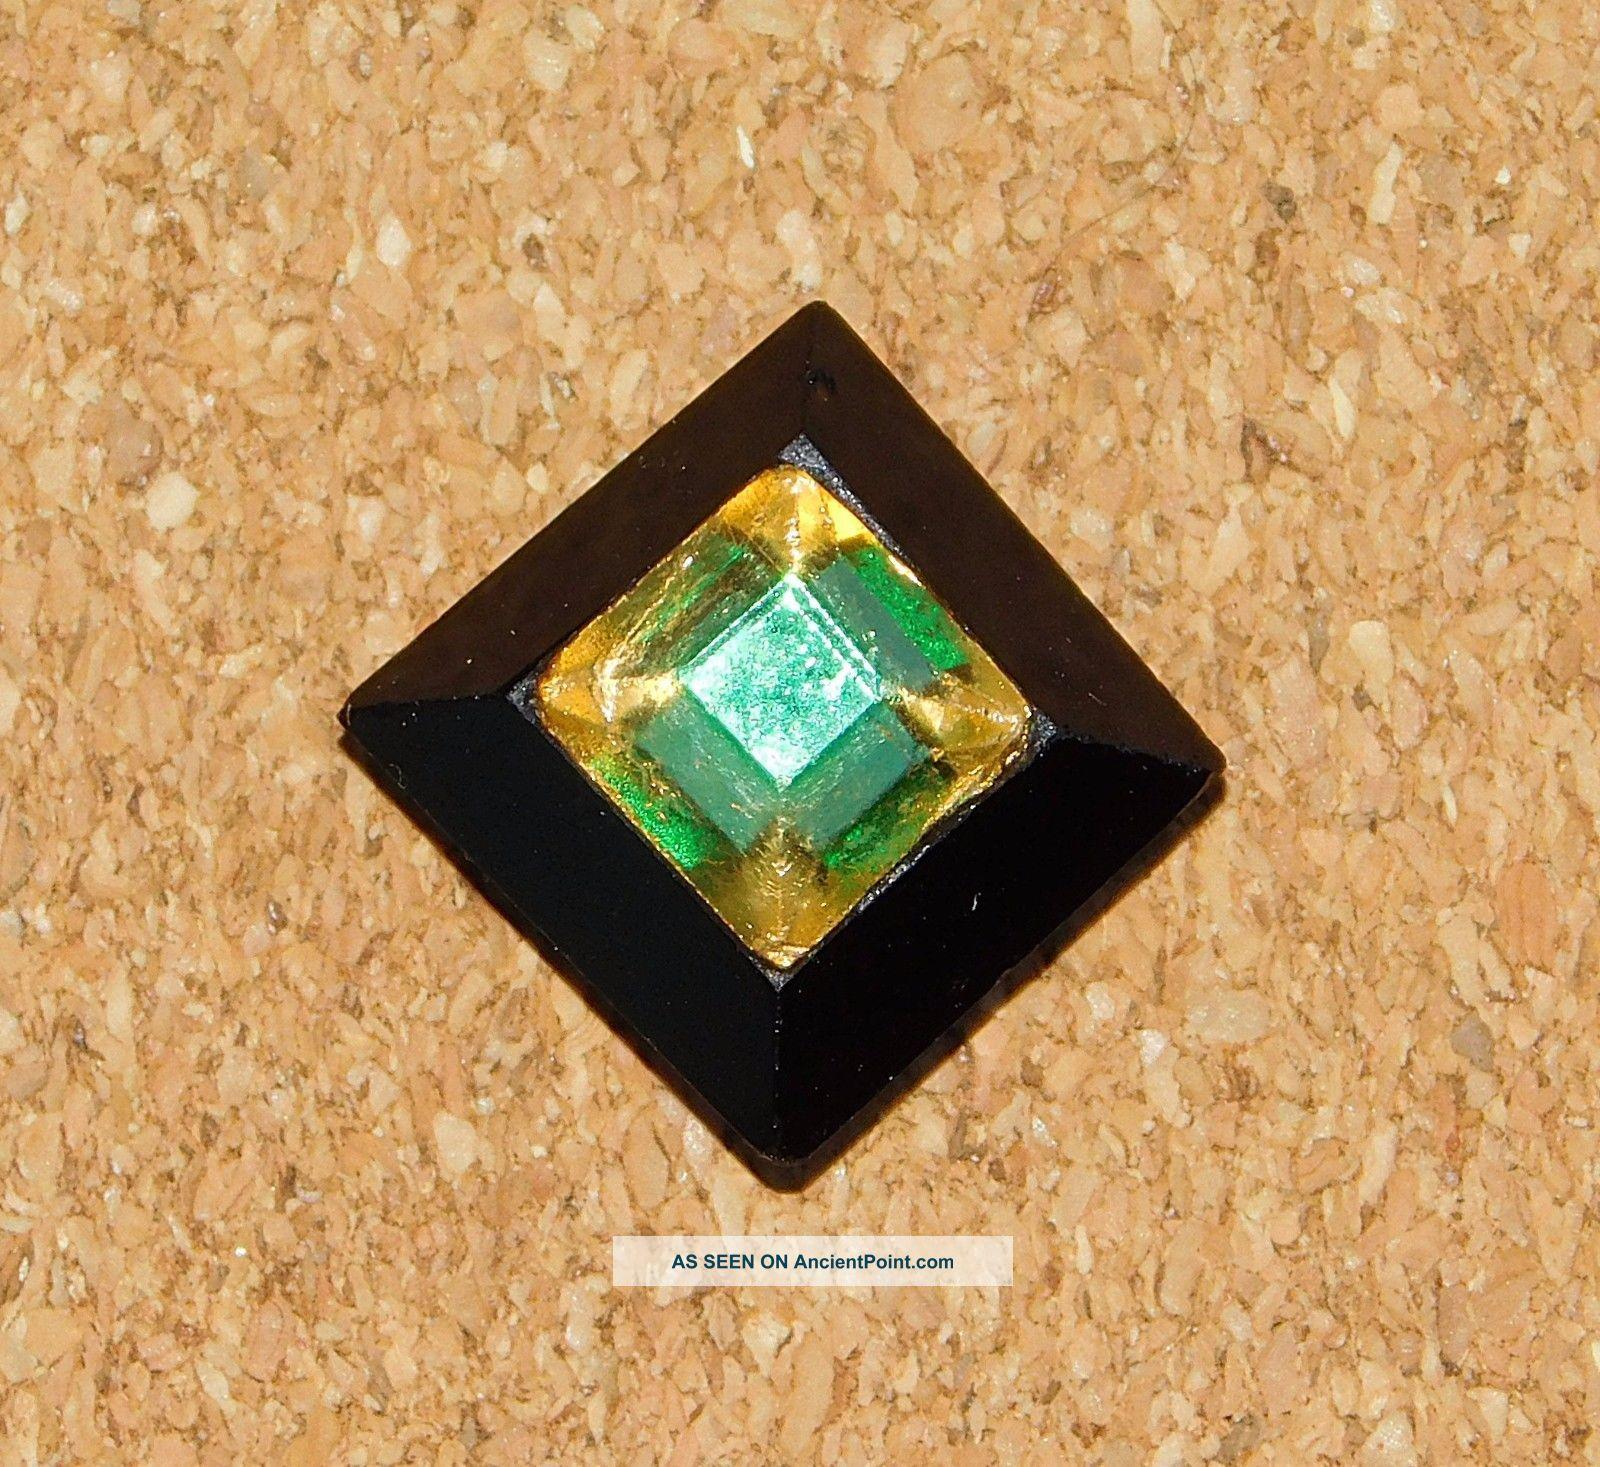 Antique Rare Tingue Emerald Green & Gold Flashing Glass Button Buttons photo